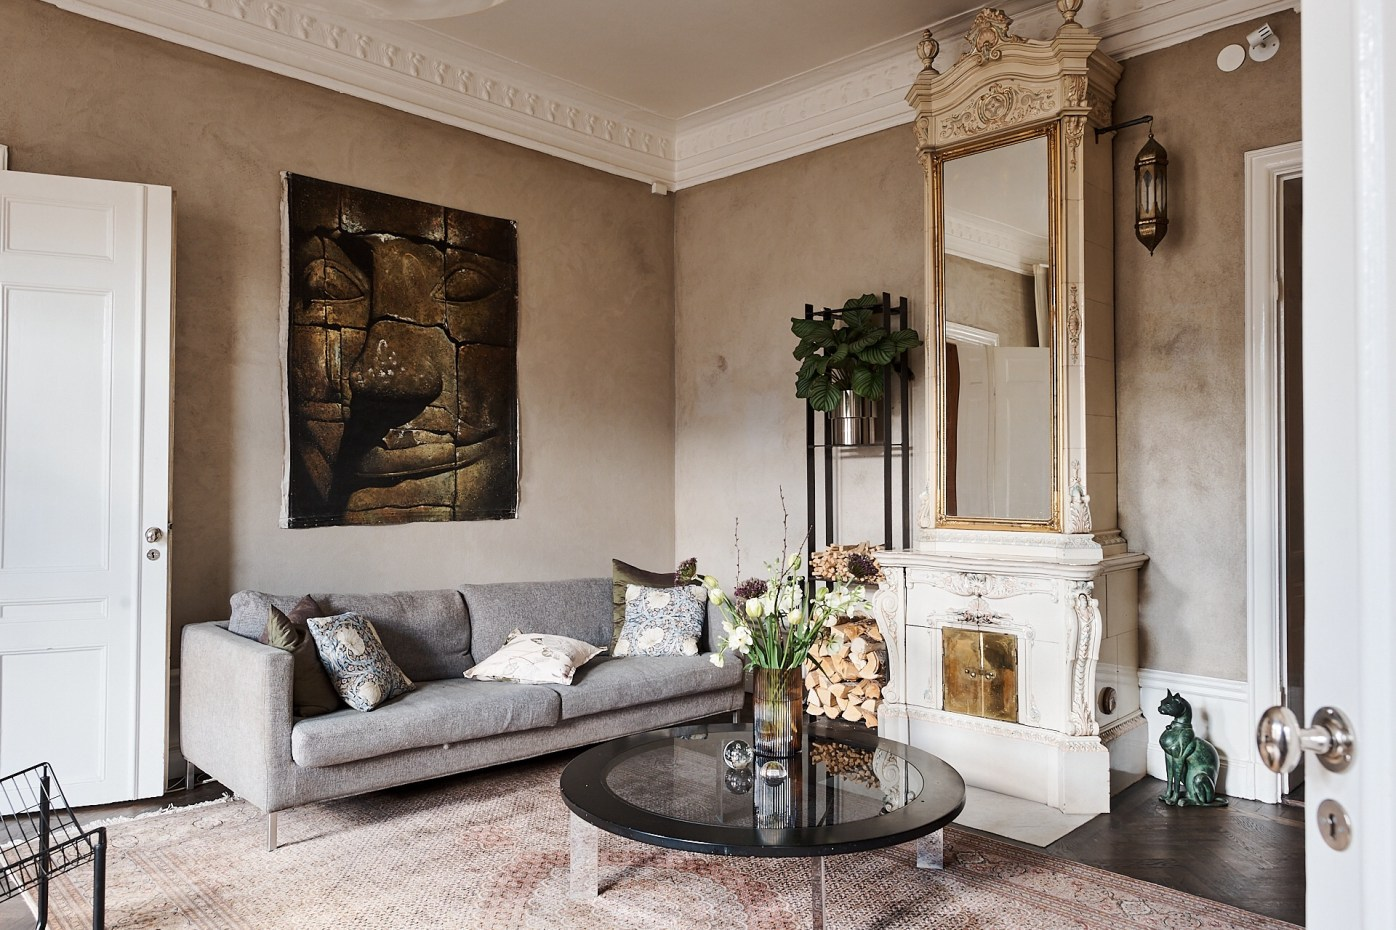 living room sofa fireplace